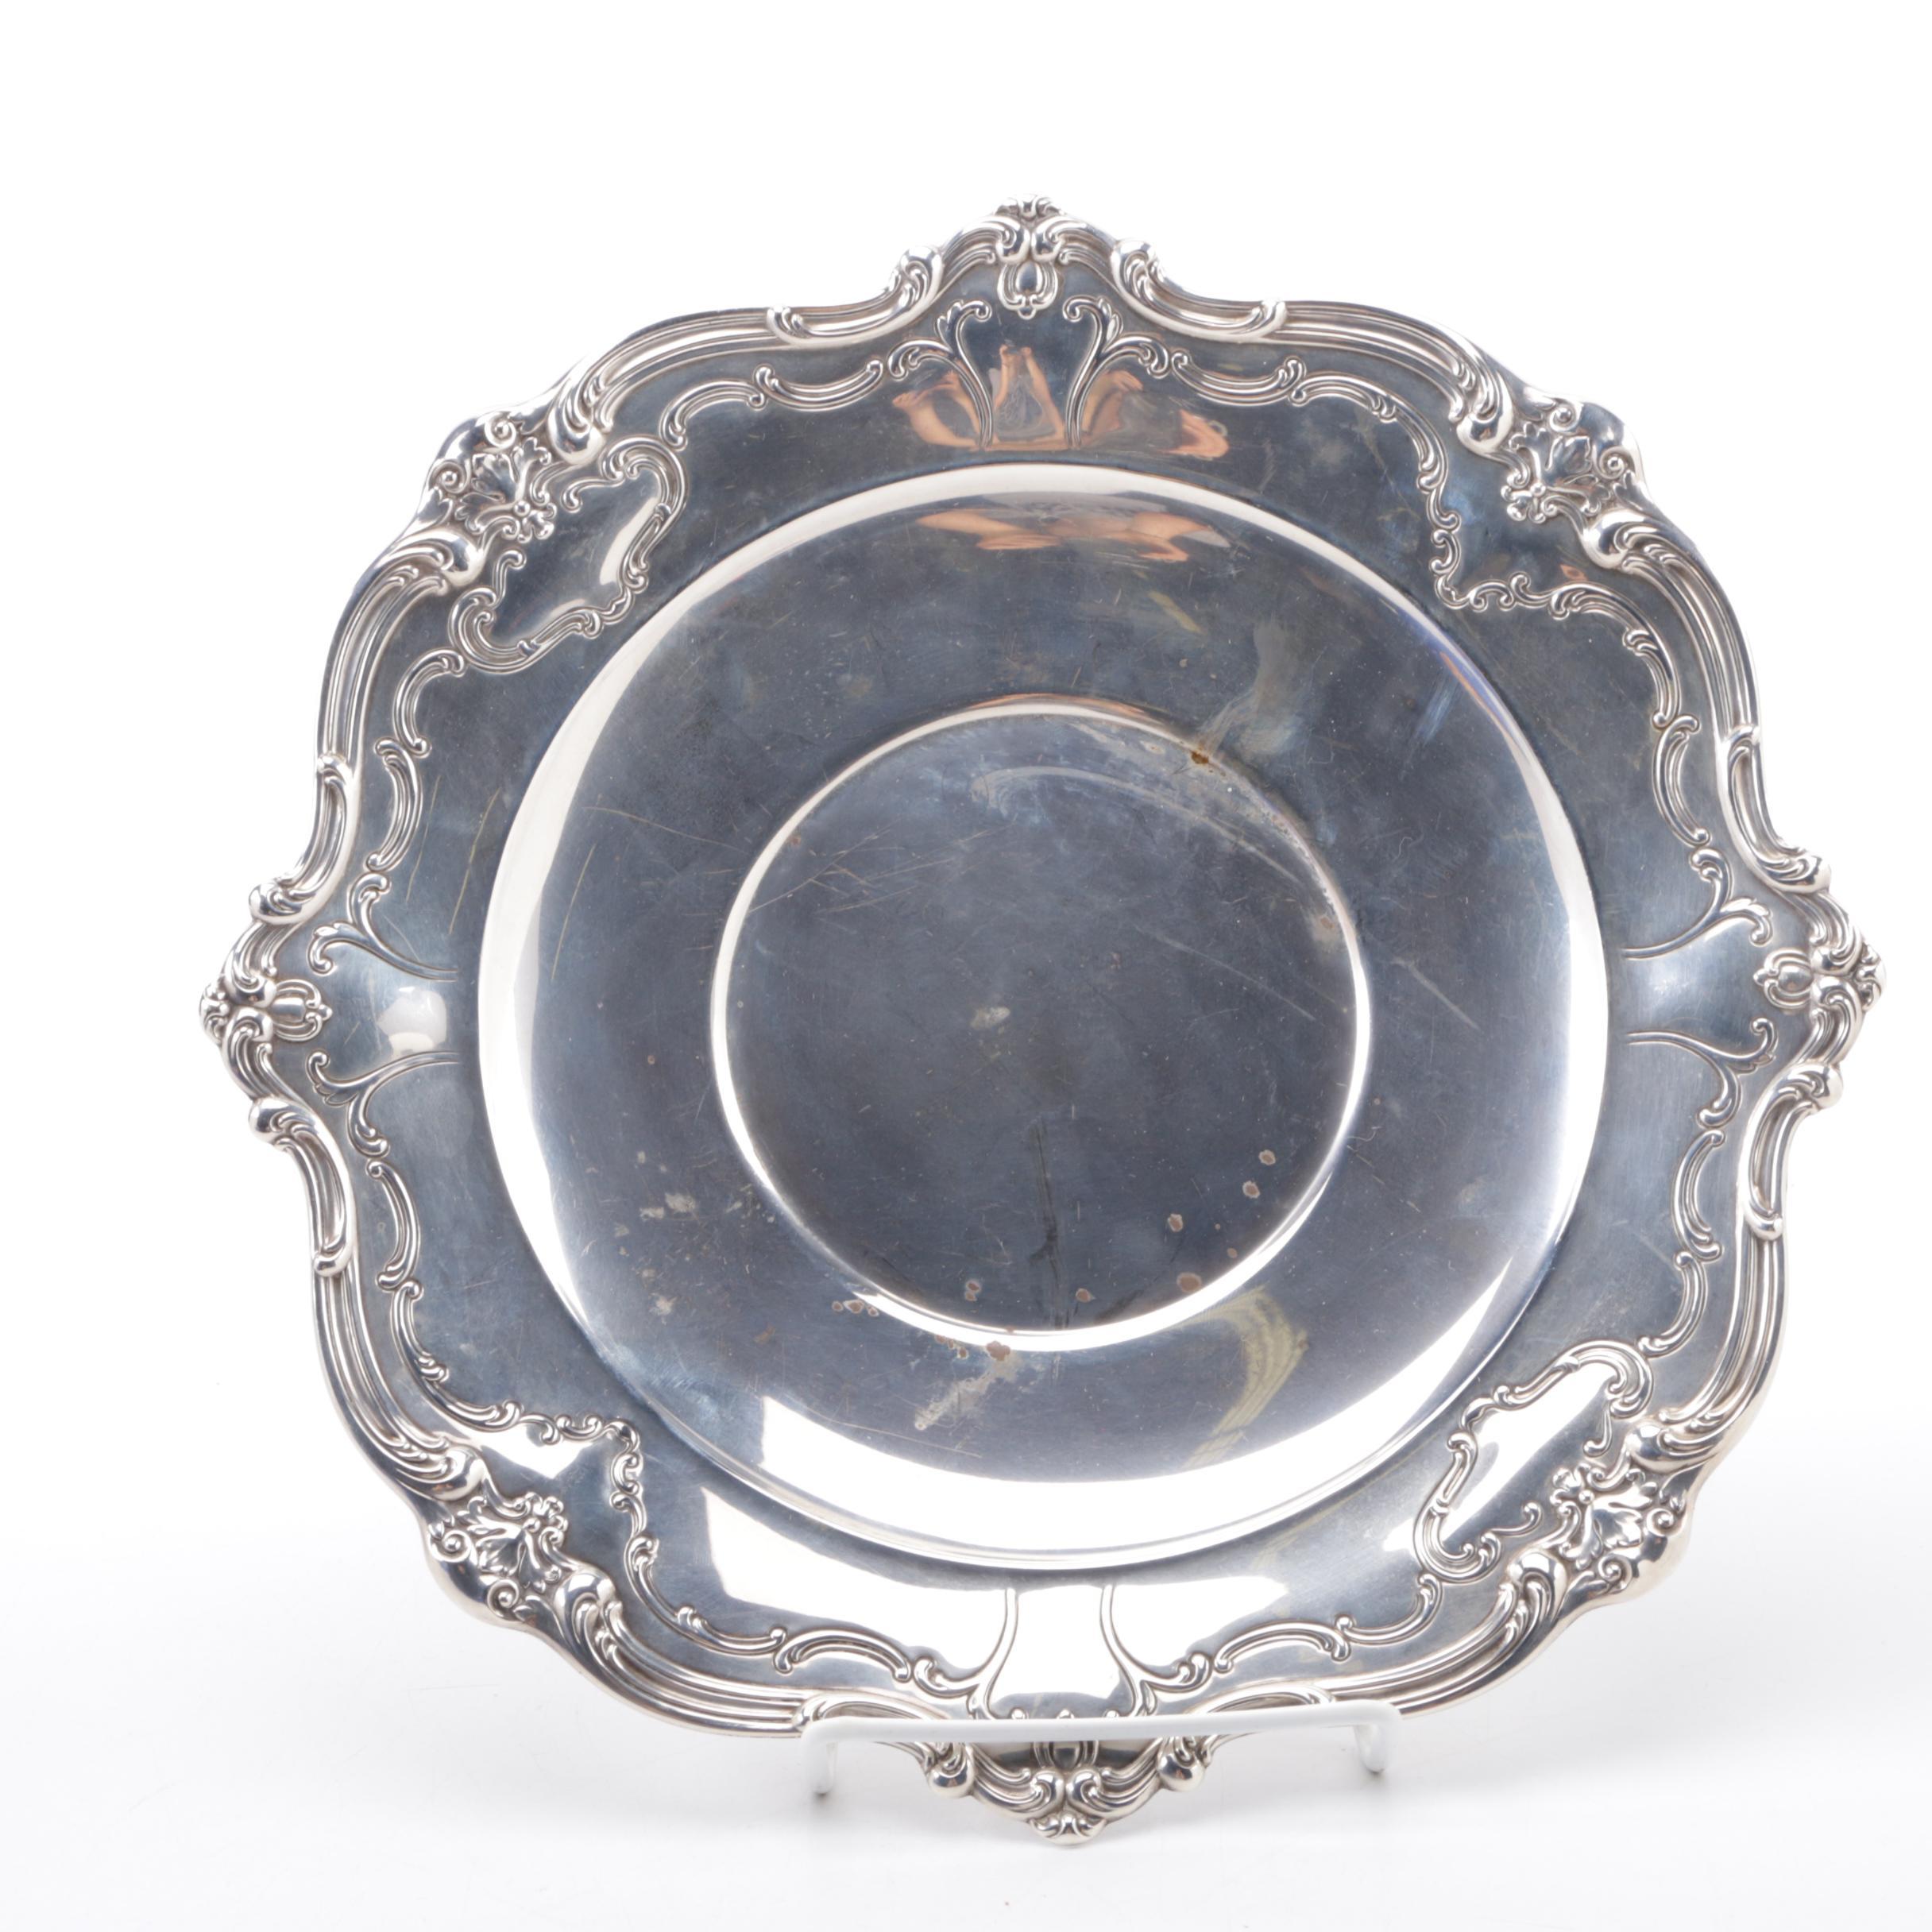 Chantilly Duchess Sandwich Plate Sterling Silver Gorham